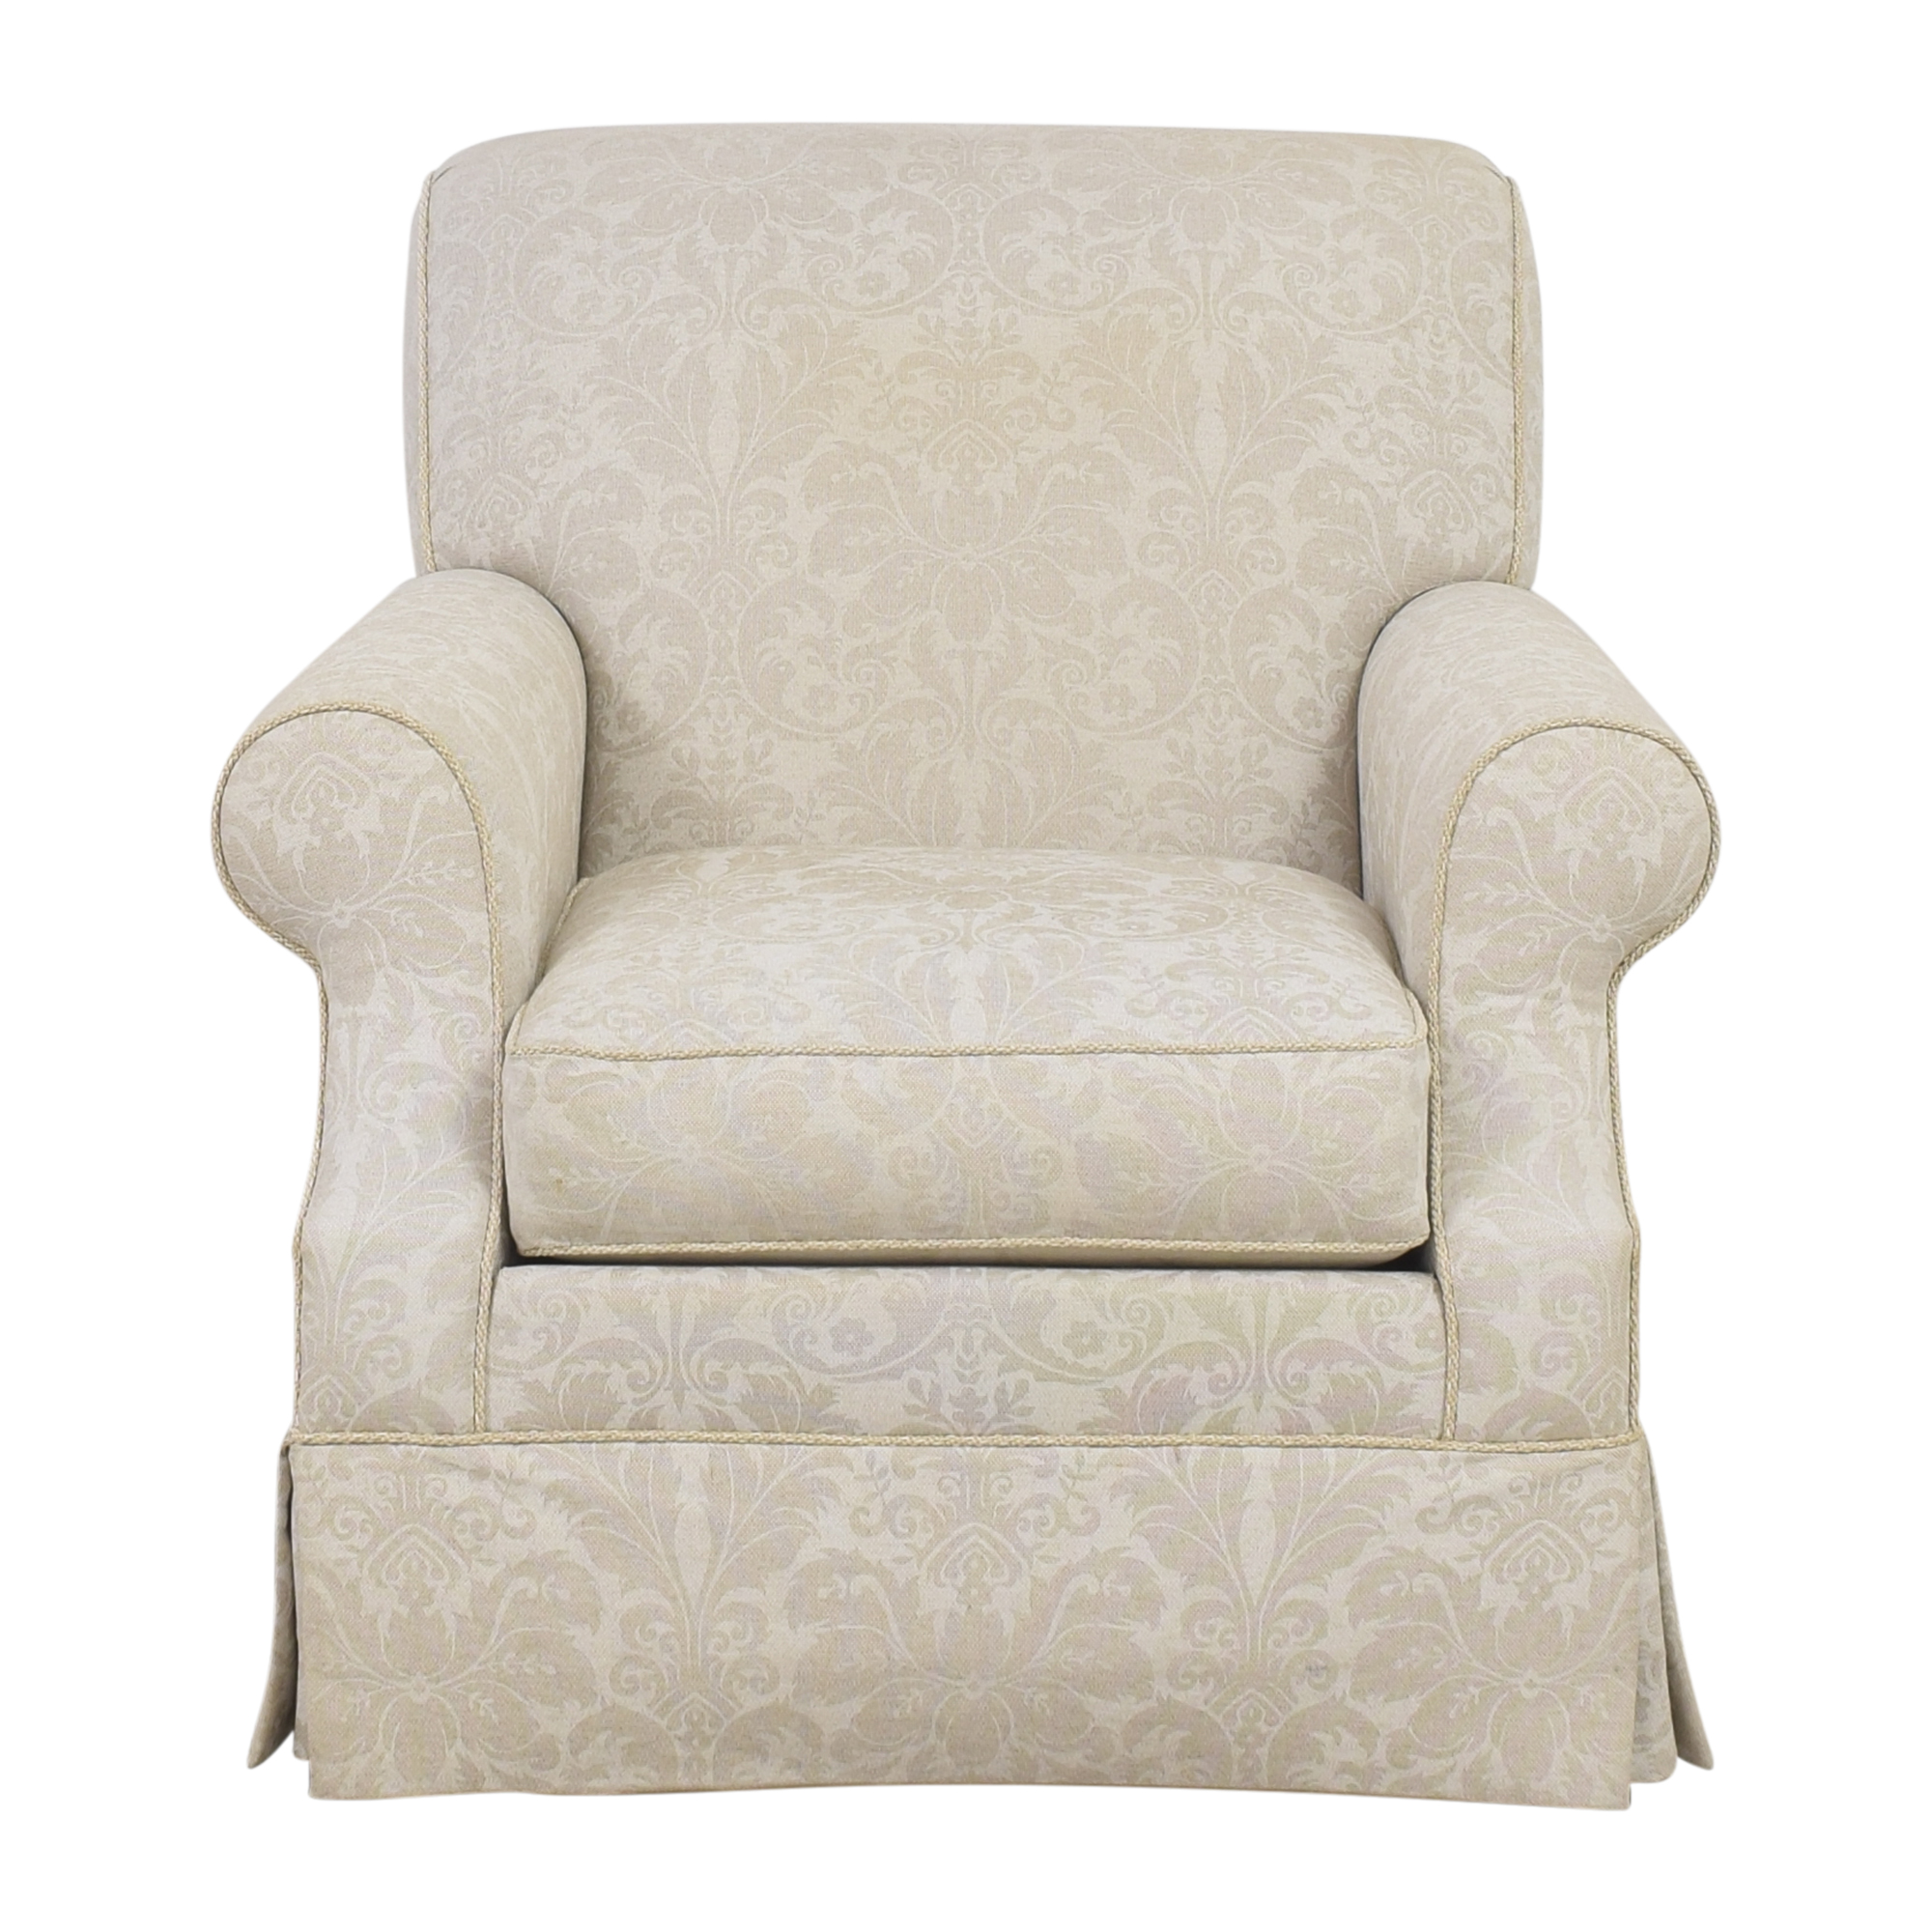 Ethan Allen Ethan Allen Damask Accent Chair nj